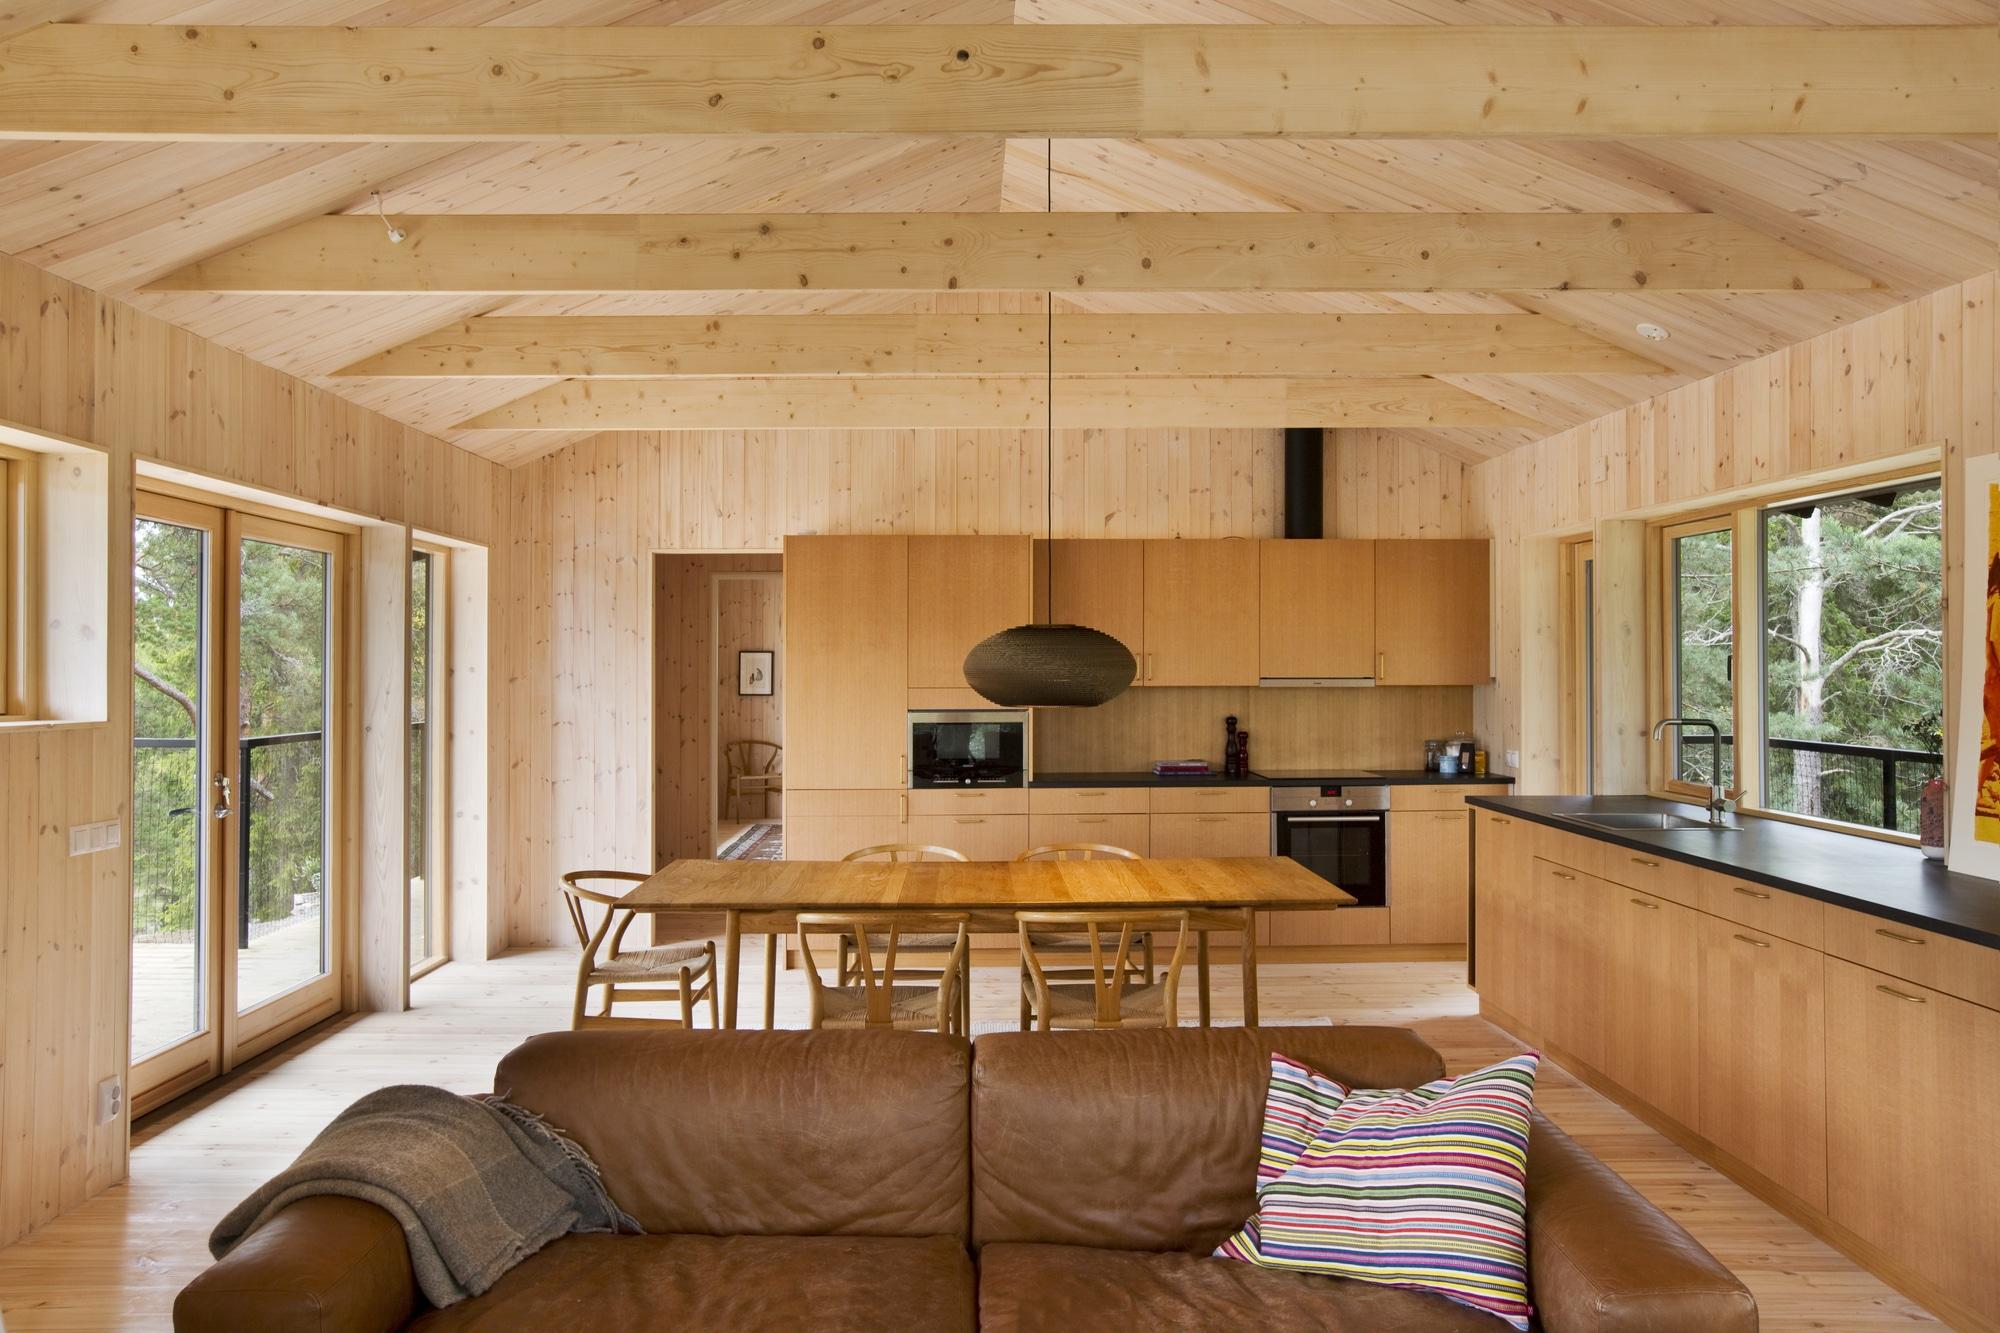 Diseo De Casa Interior Best Diseo De Interior Casa Moderna With